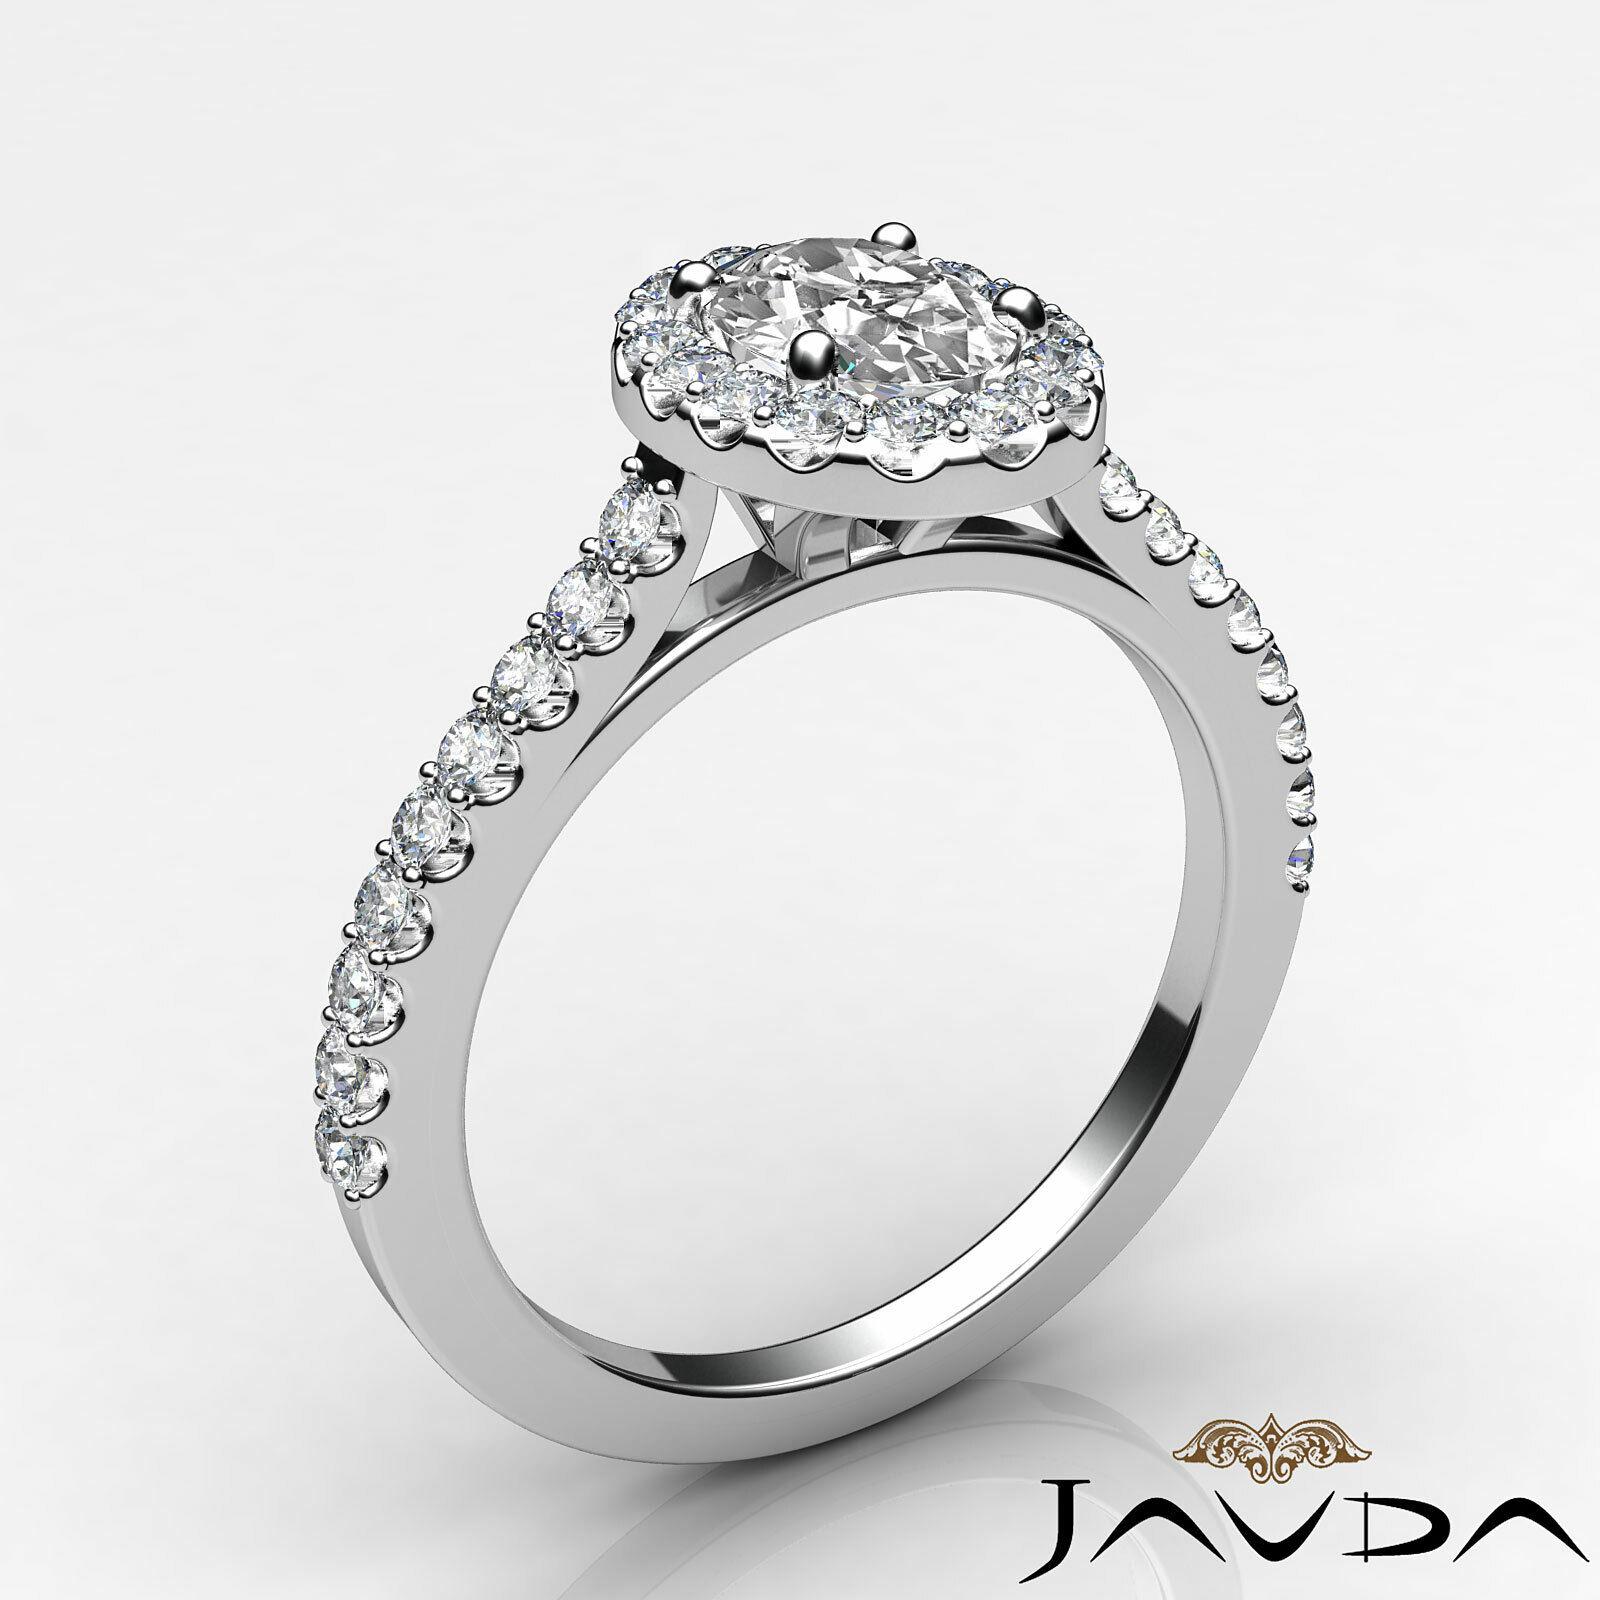 1.6ctw Prong Setting Oval Diamond Engagement Ring GIA H-VS1 White Gold Women New 1